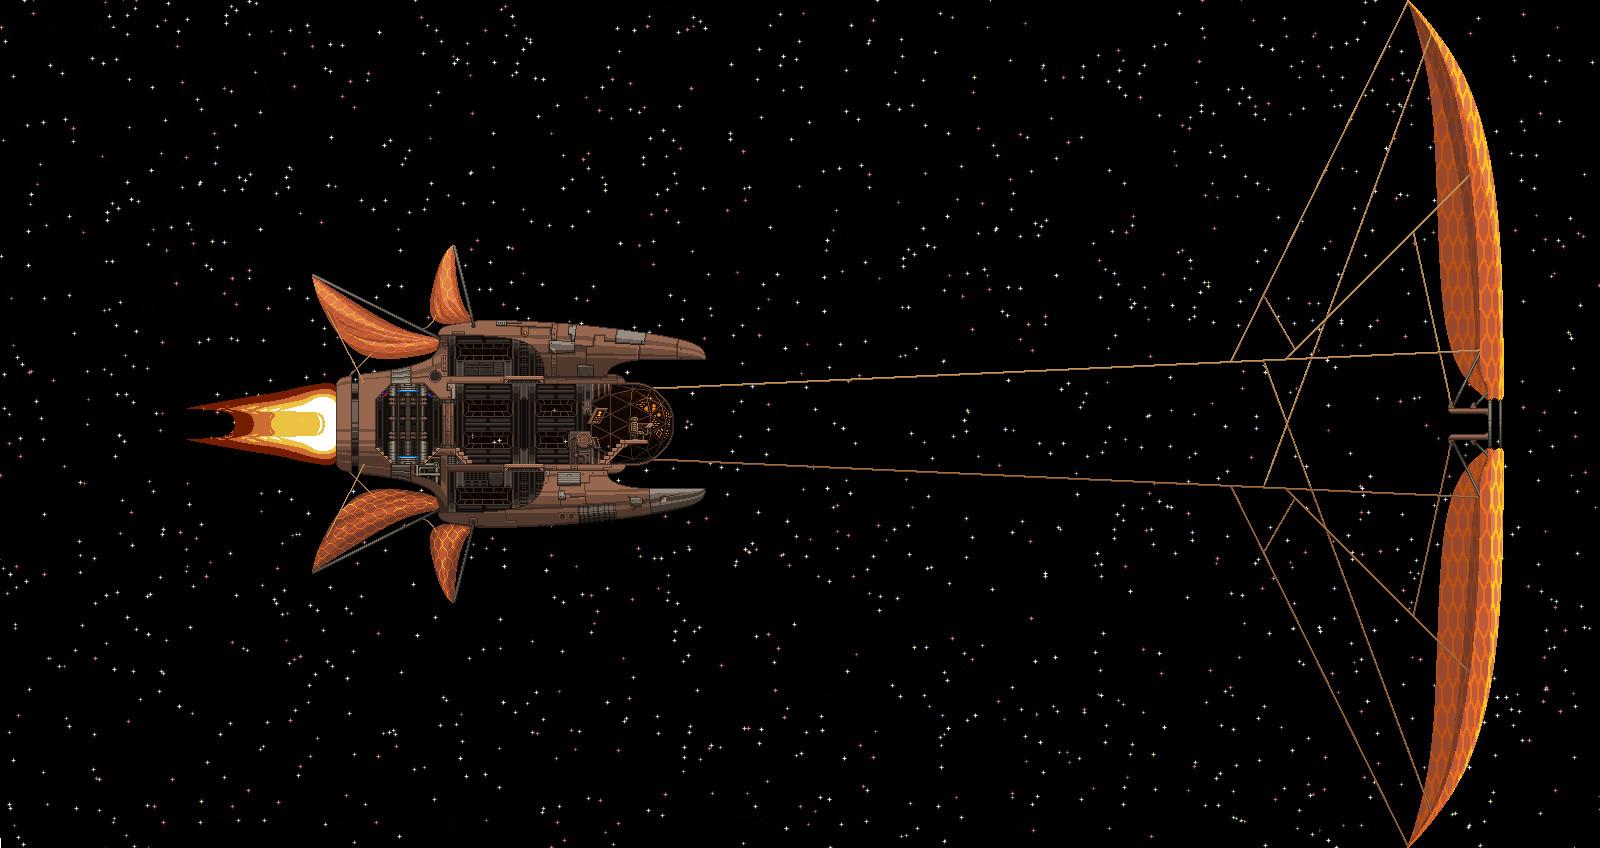 Artstation Furnace Wind Starbound Ship Mod Alastair Parkin